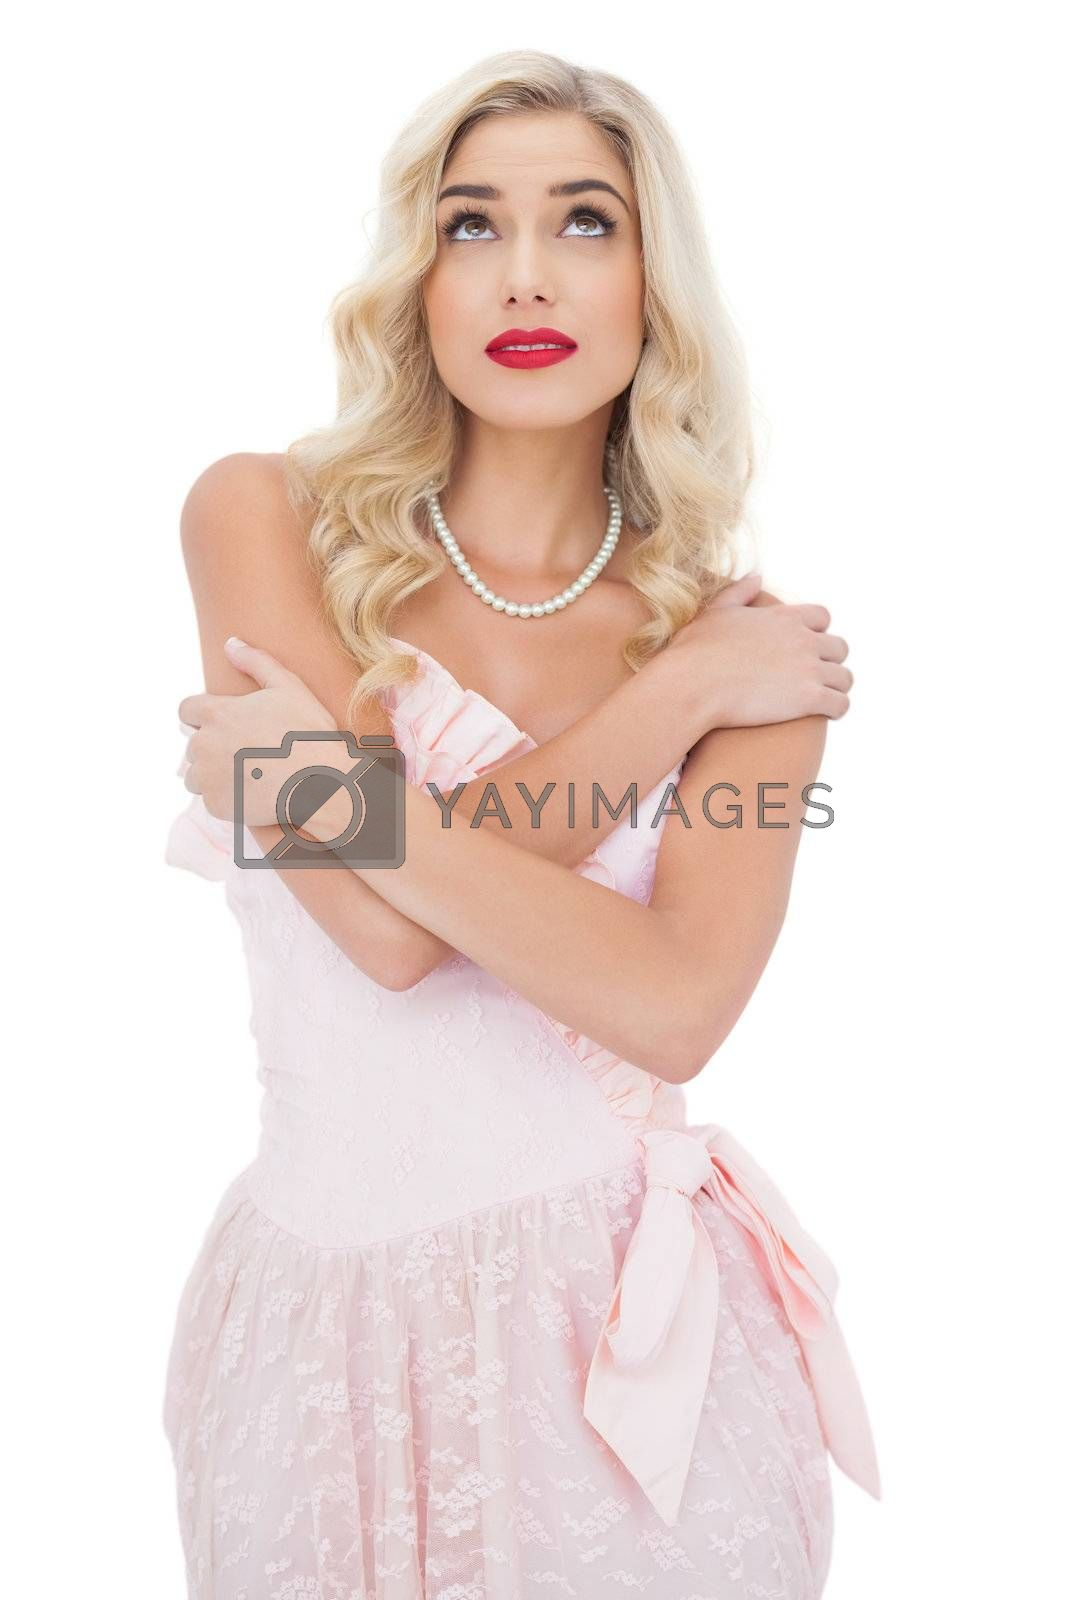 Pensive blonde model in pink dress posing holding her shoulders and looking up by Wavebreakmedia